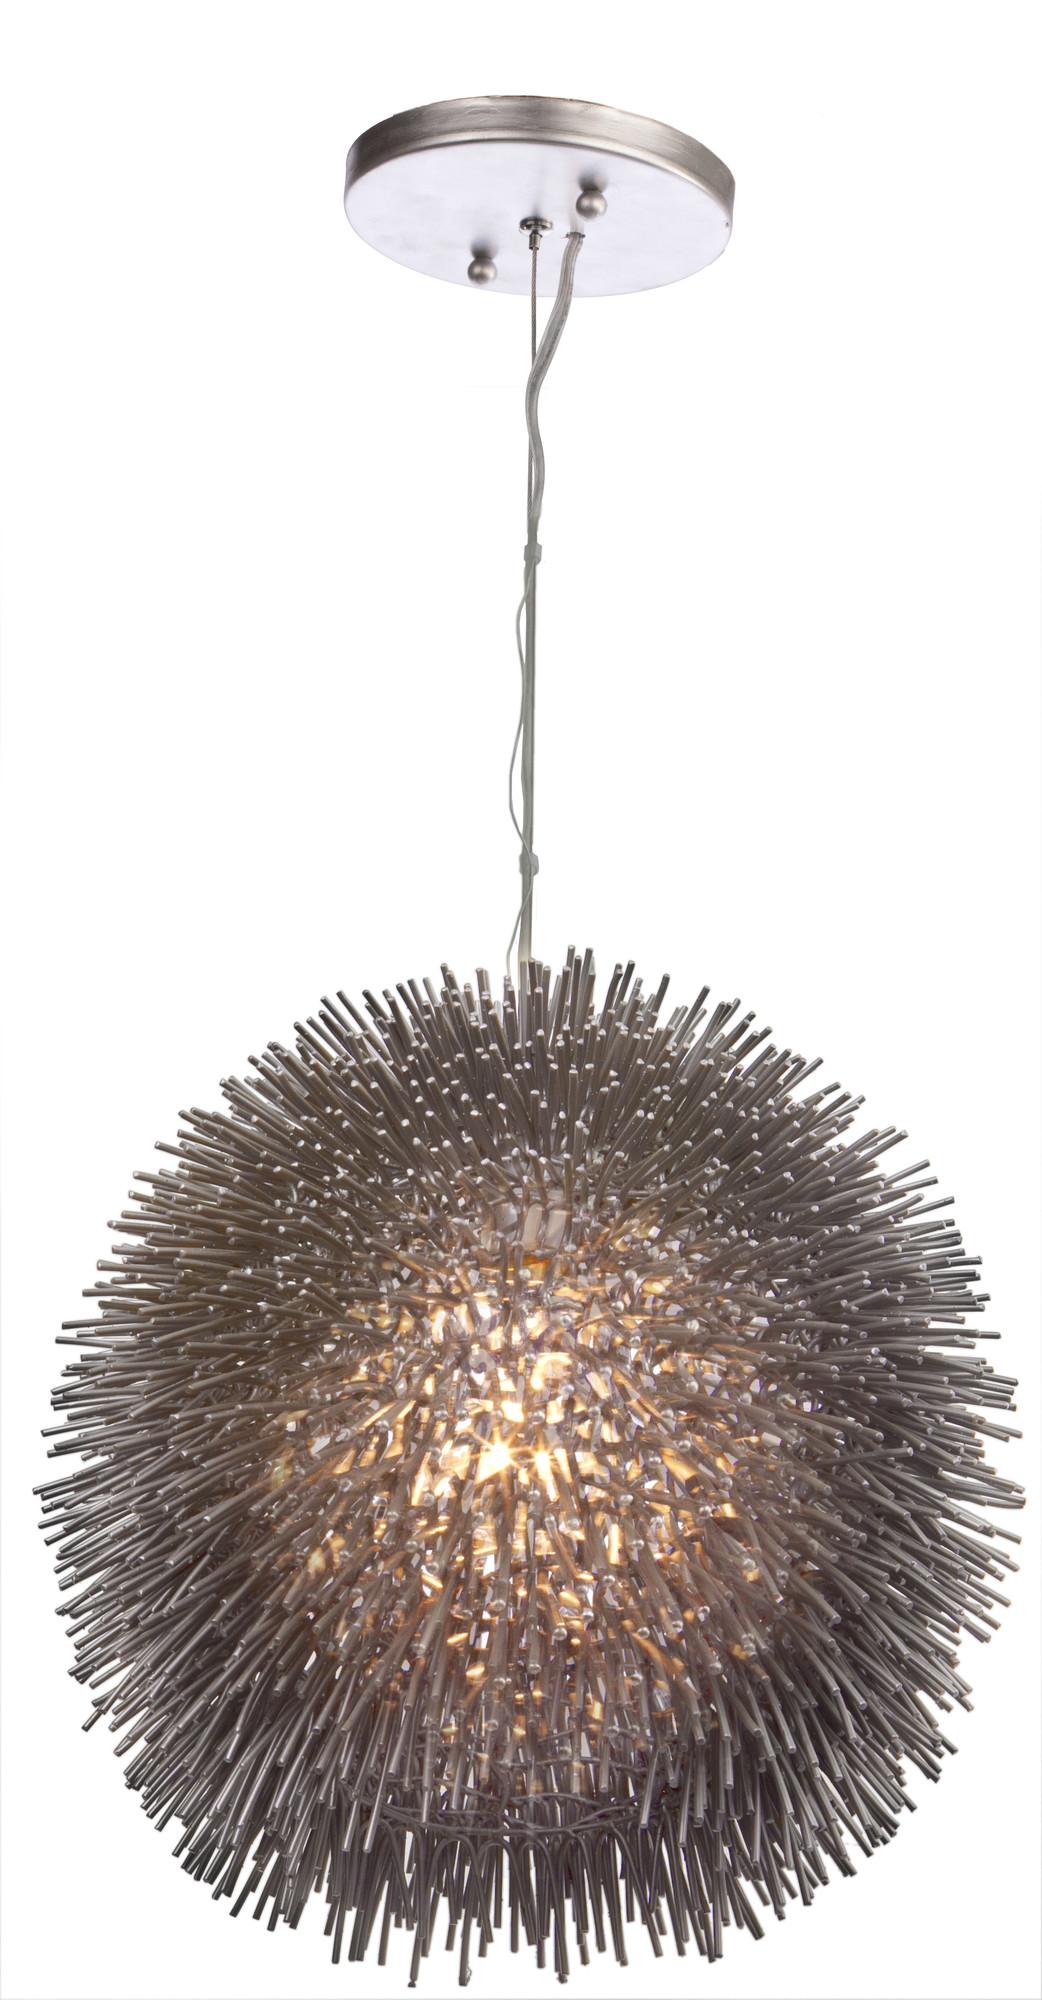 Varaluz-Urchin-1-Light-Mini-Pendant-169 (5).jpg